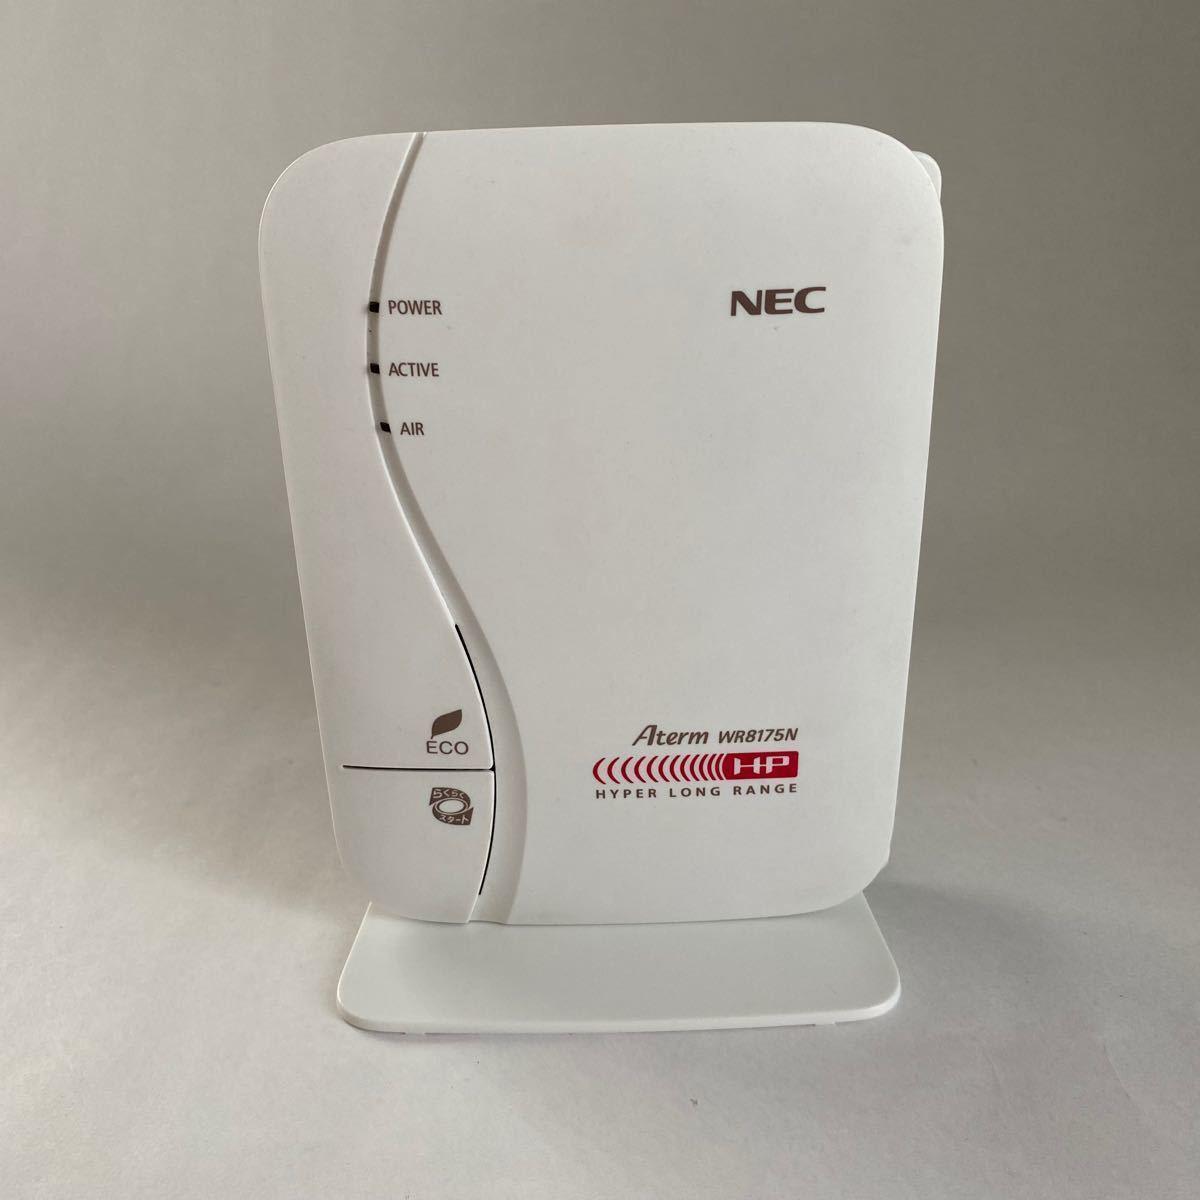 NEC 無線LAN Wi-Fiルーター Aterm PA-WR8175N-HP